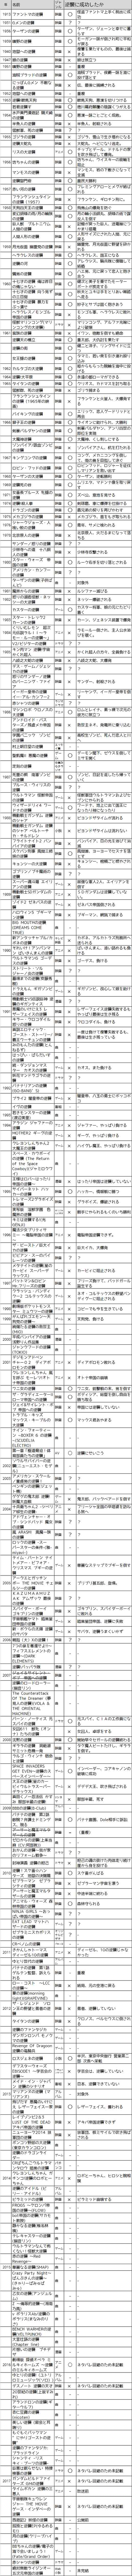 https://cdn-ak2.f.st-hatena.com/images/fotolife/k/kasumi19732004/20170910/20170910124713_original.jpg